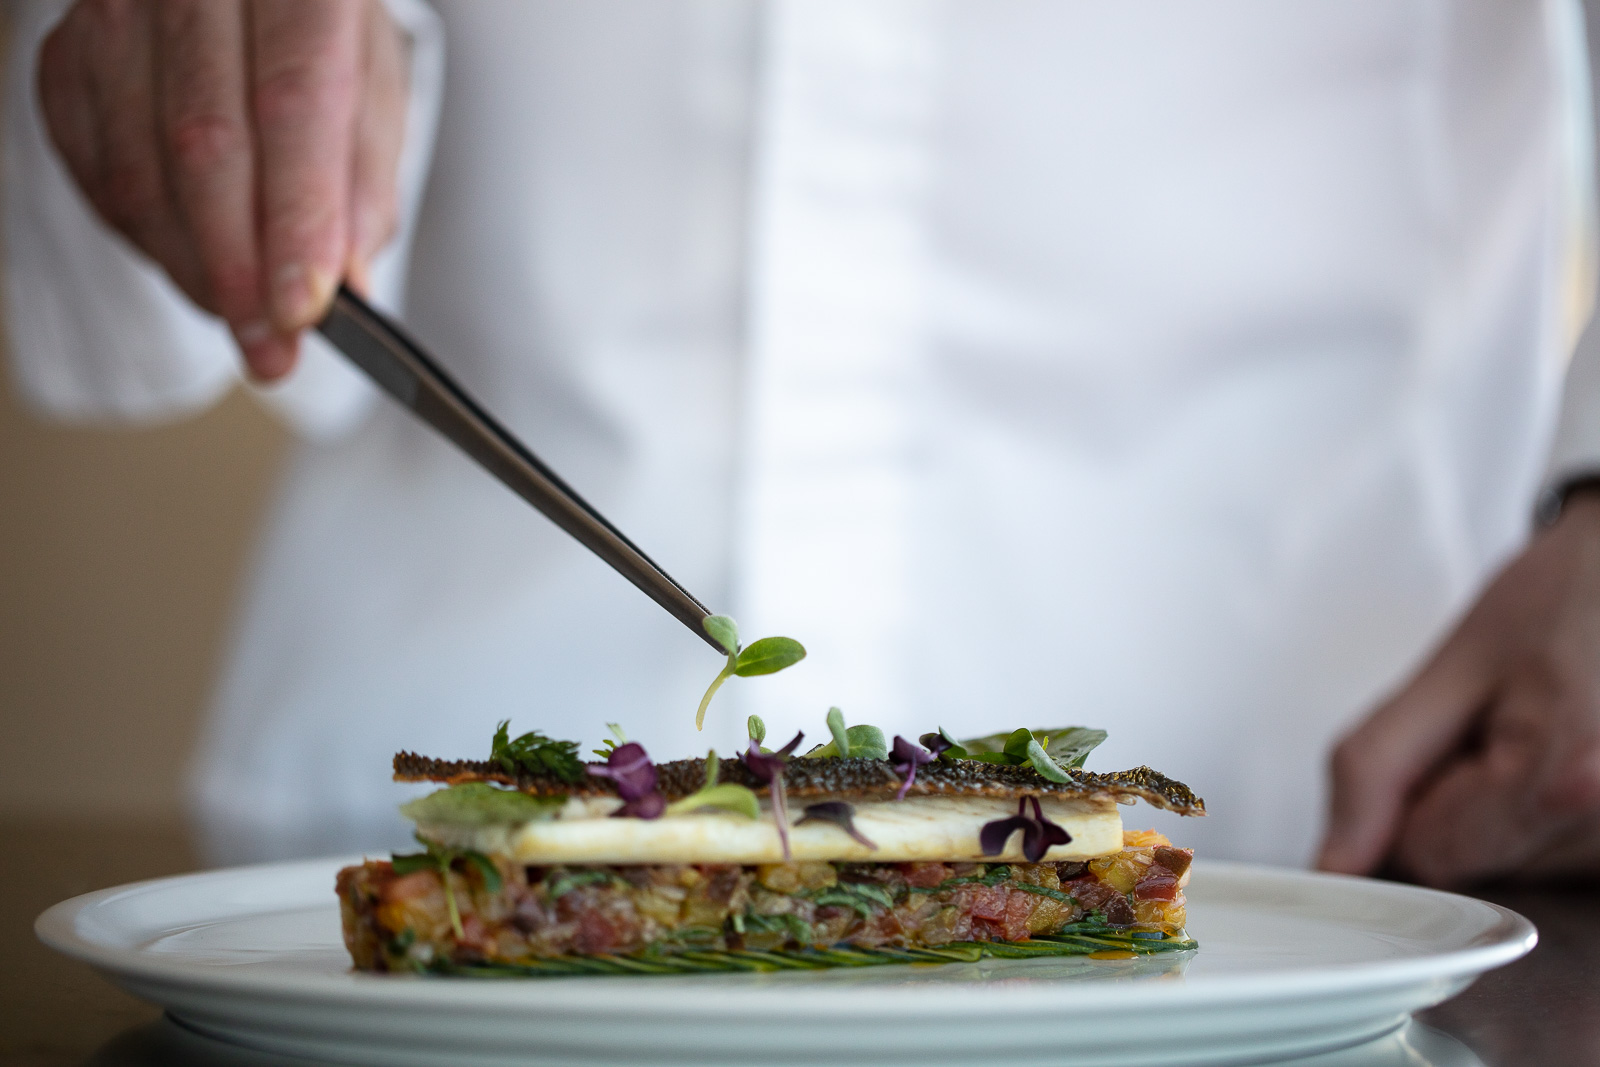 Franck_Hamel_Sofitel_Quiberon_valerie_paumelle_agent-photographe_culinaire-foodphotographer (17).jpg